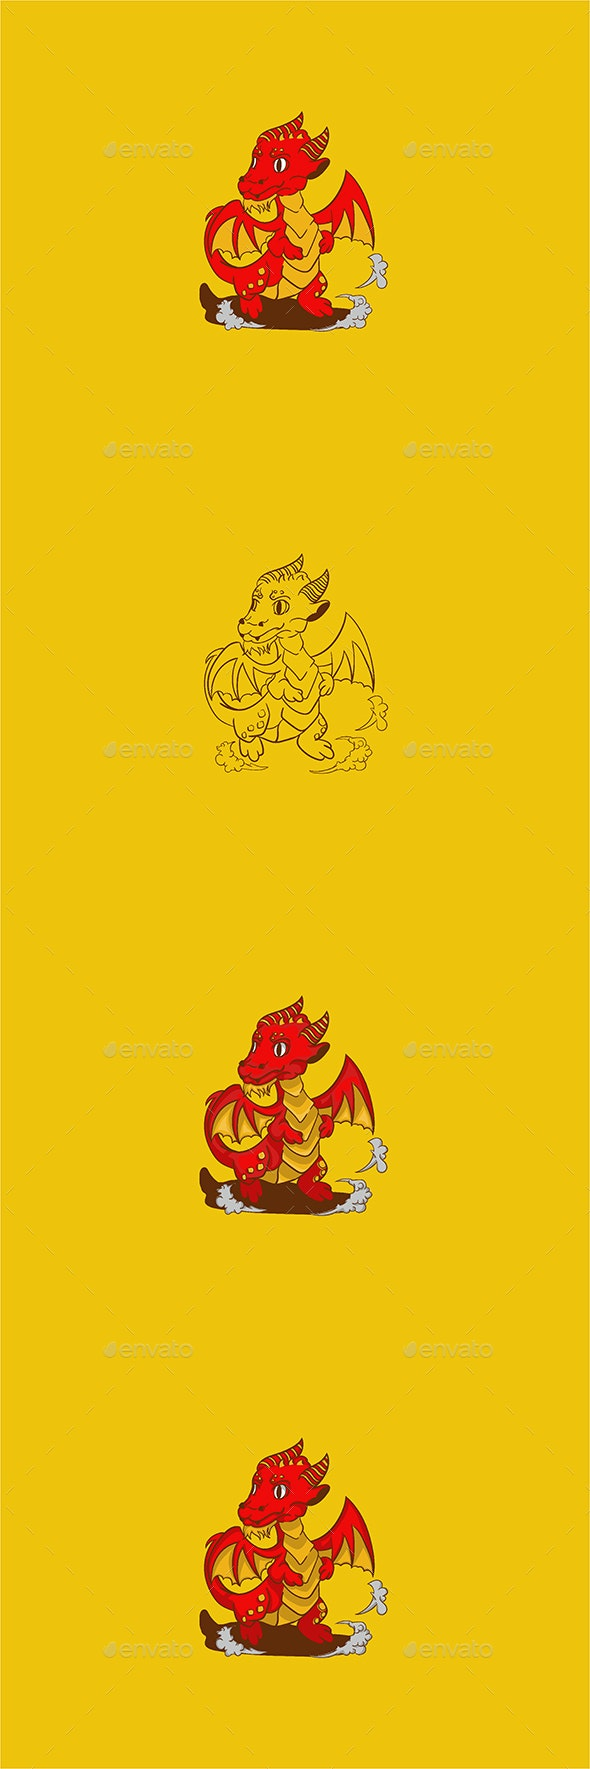 Dragie - Vector Art - Monsters Characters